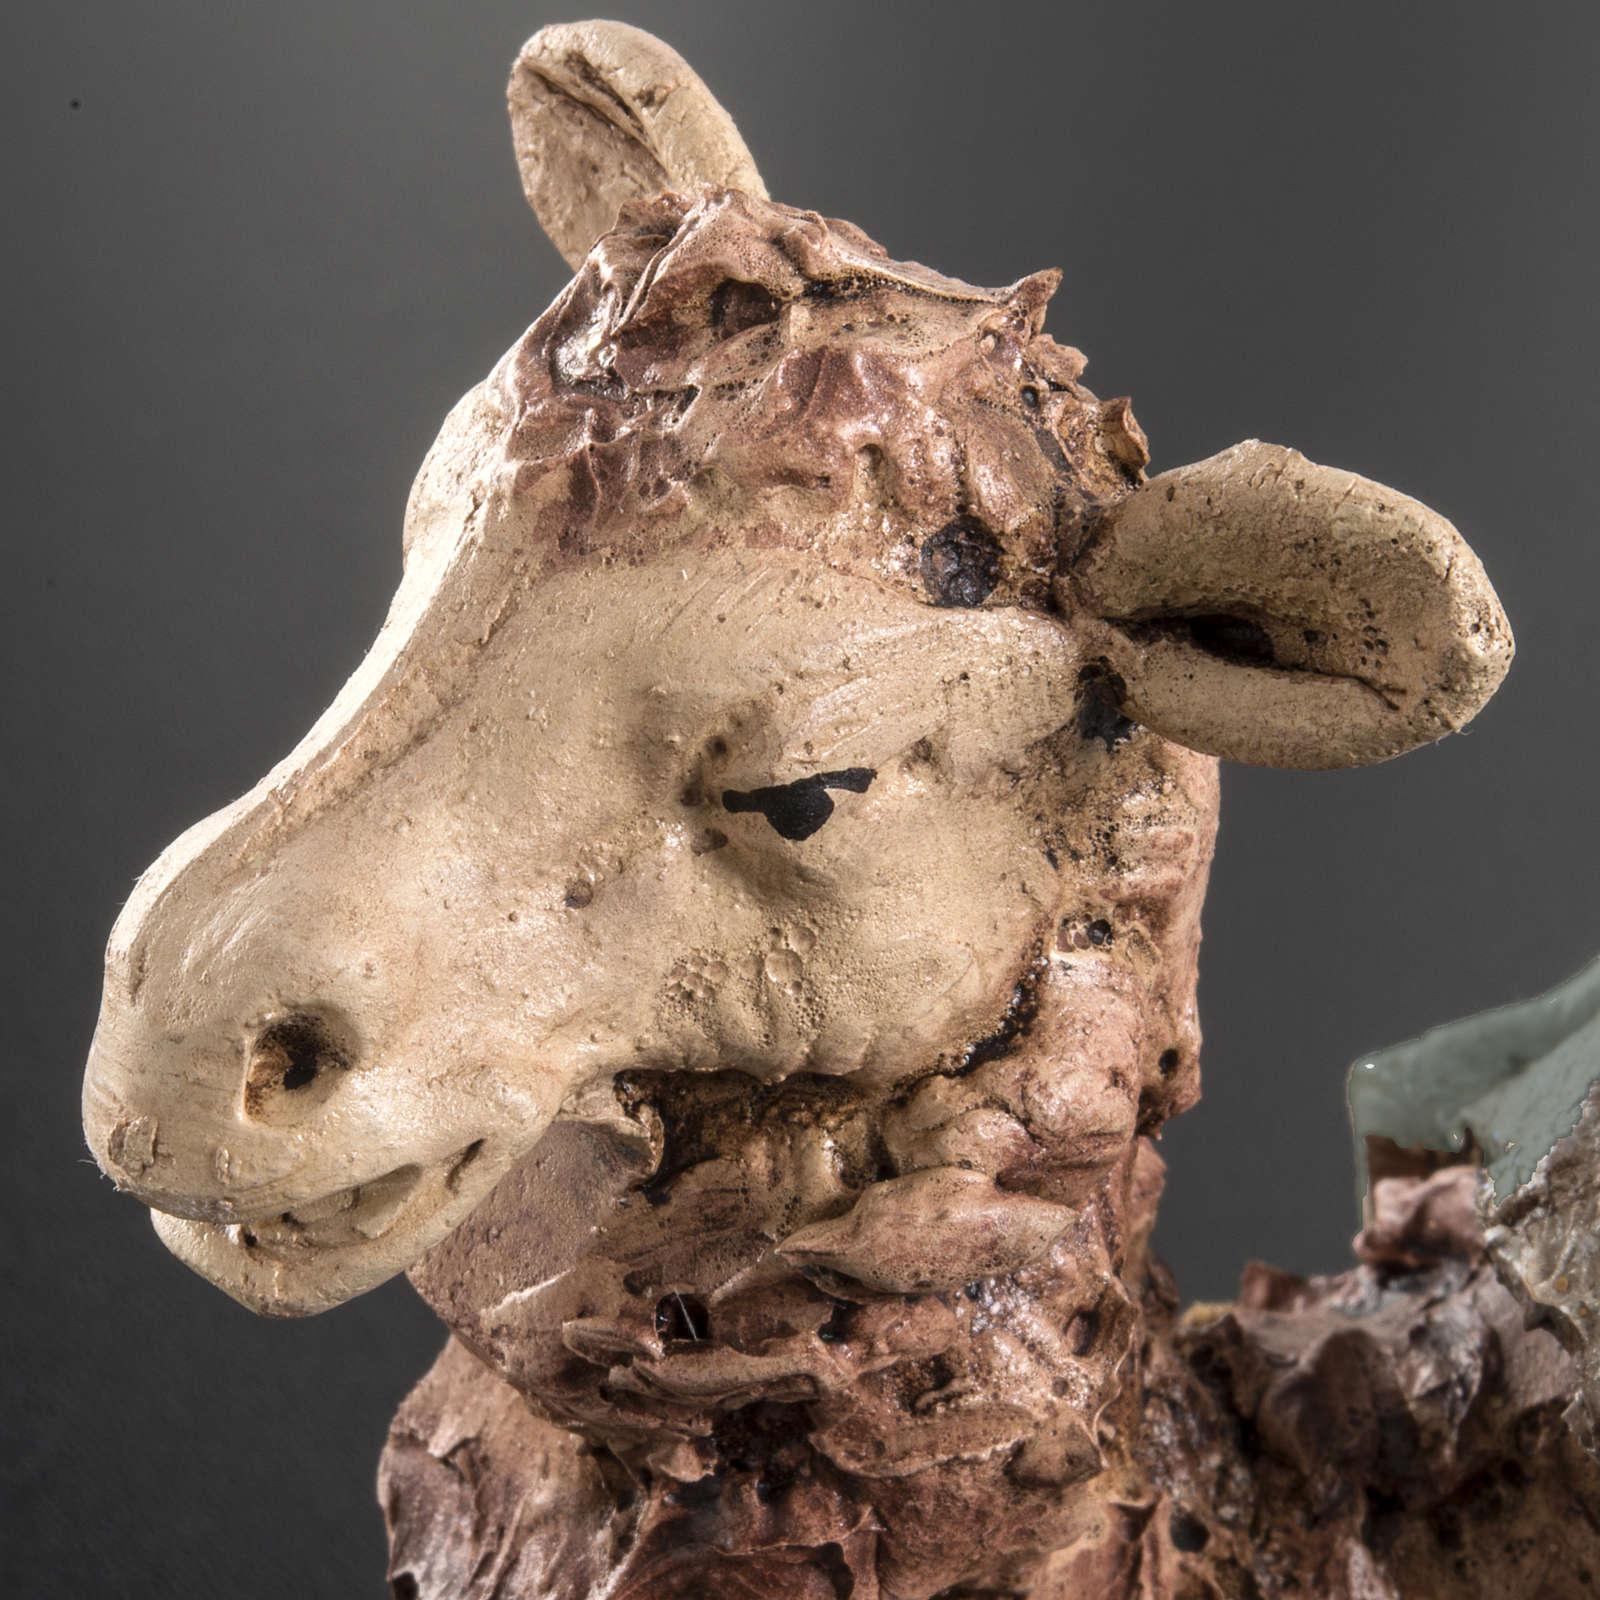 Green camel terracotta 18 cm 4